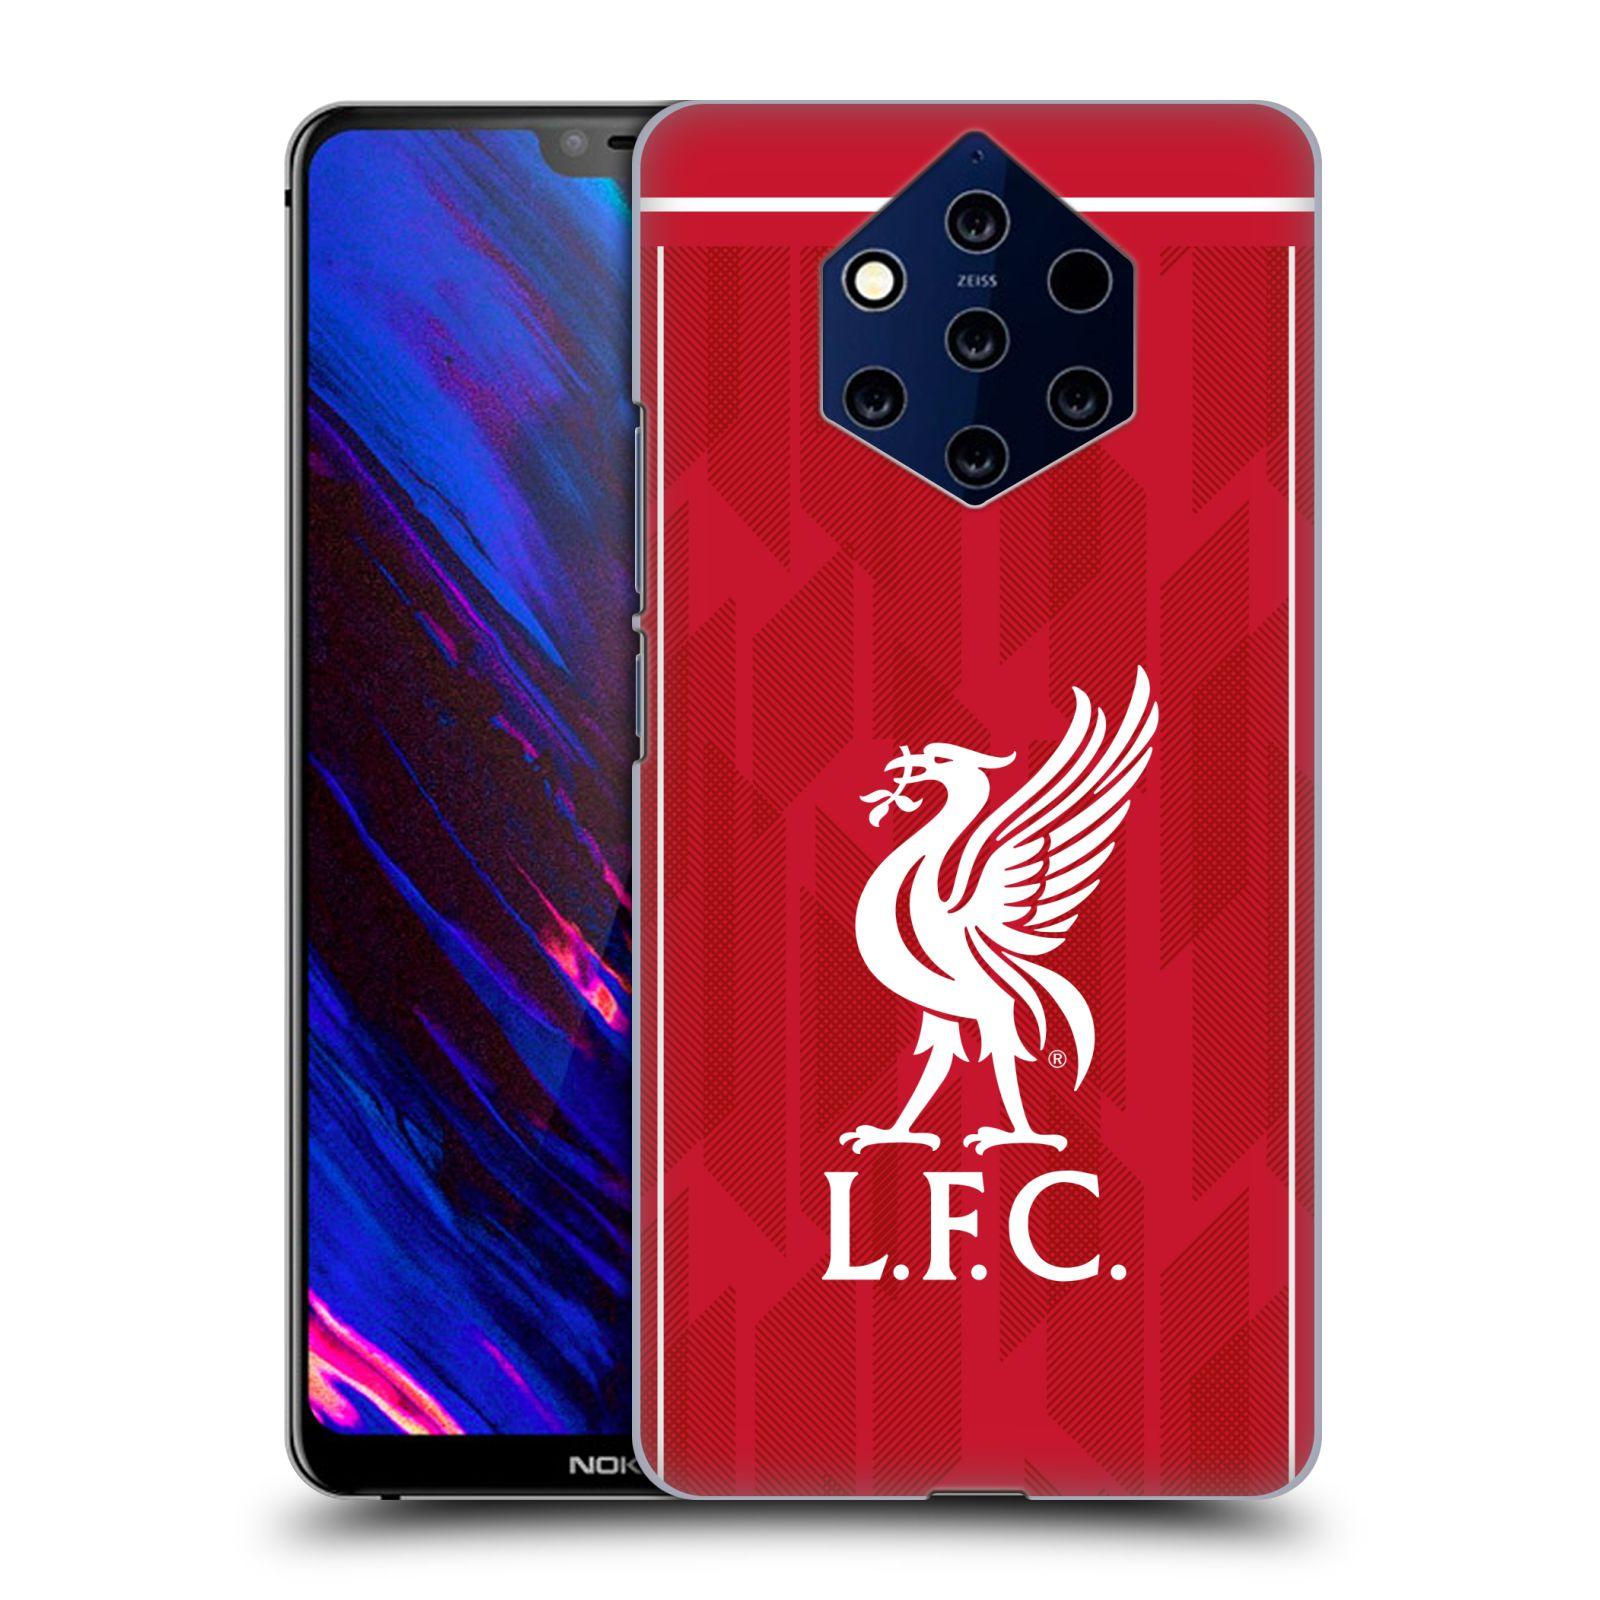 Plastové pouzdro na mobil Nokia 9 PureView - Head Case - Liverpool FC - L.F.C. Home kit